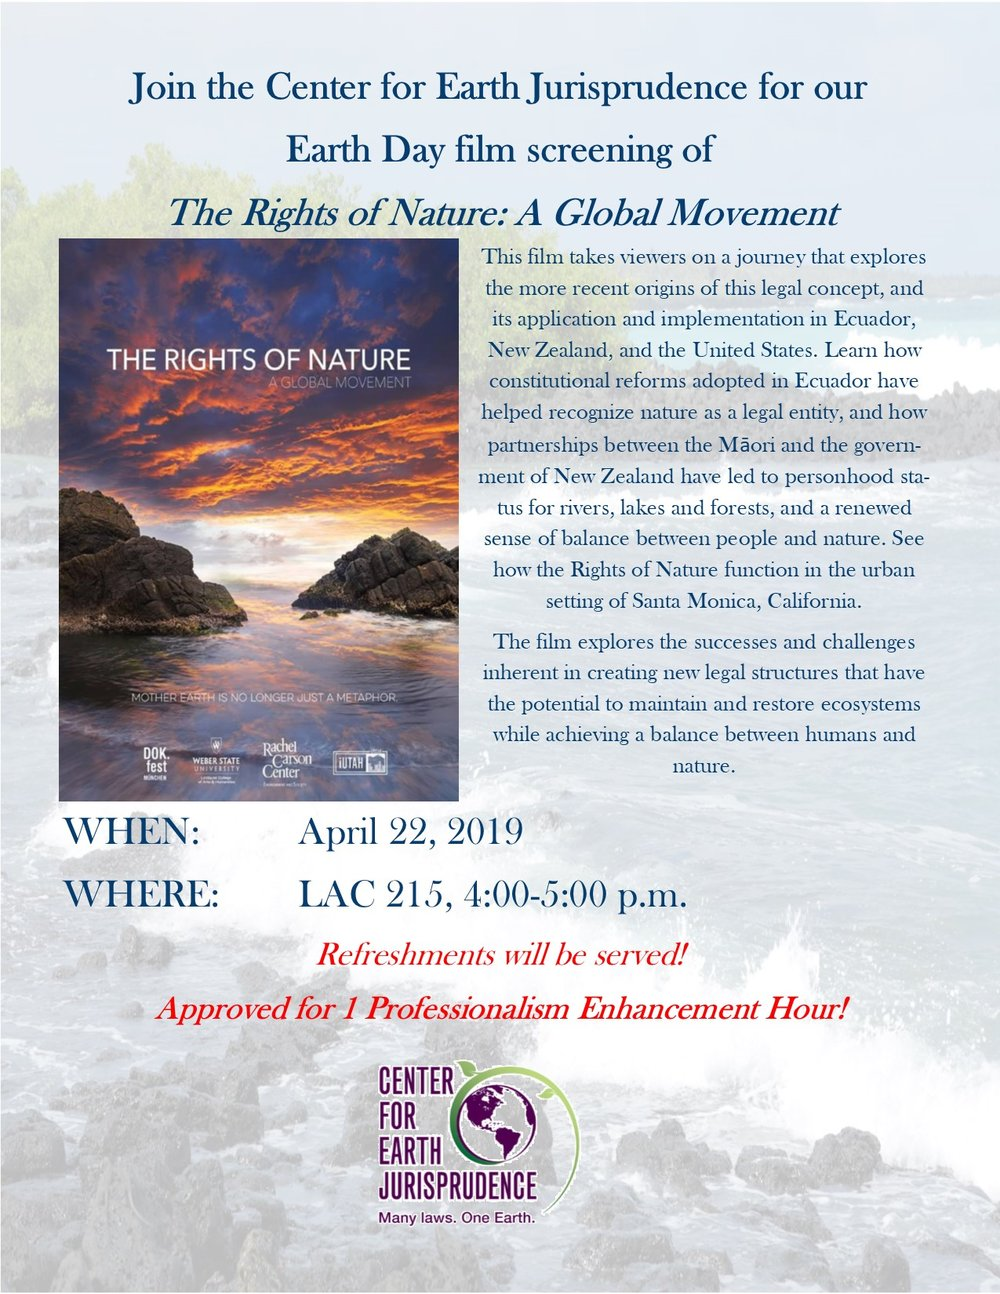 Earth Day 2019 Film Screening Flyer DRAFT.jpg